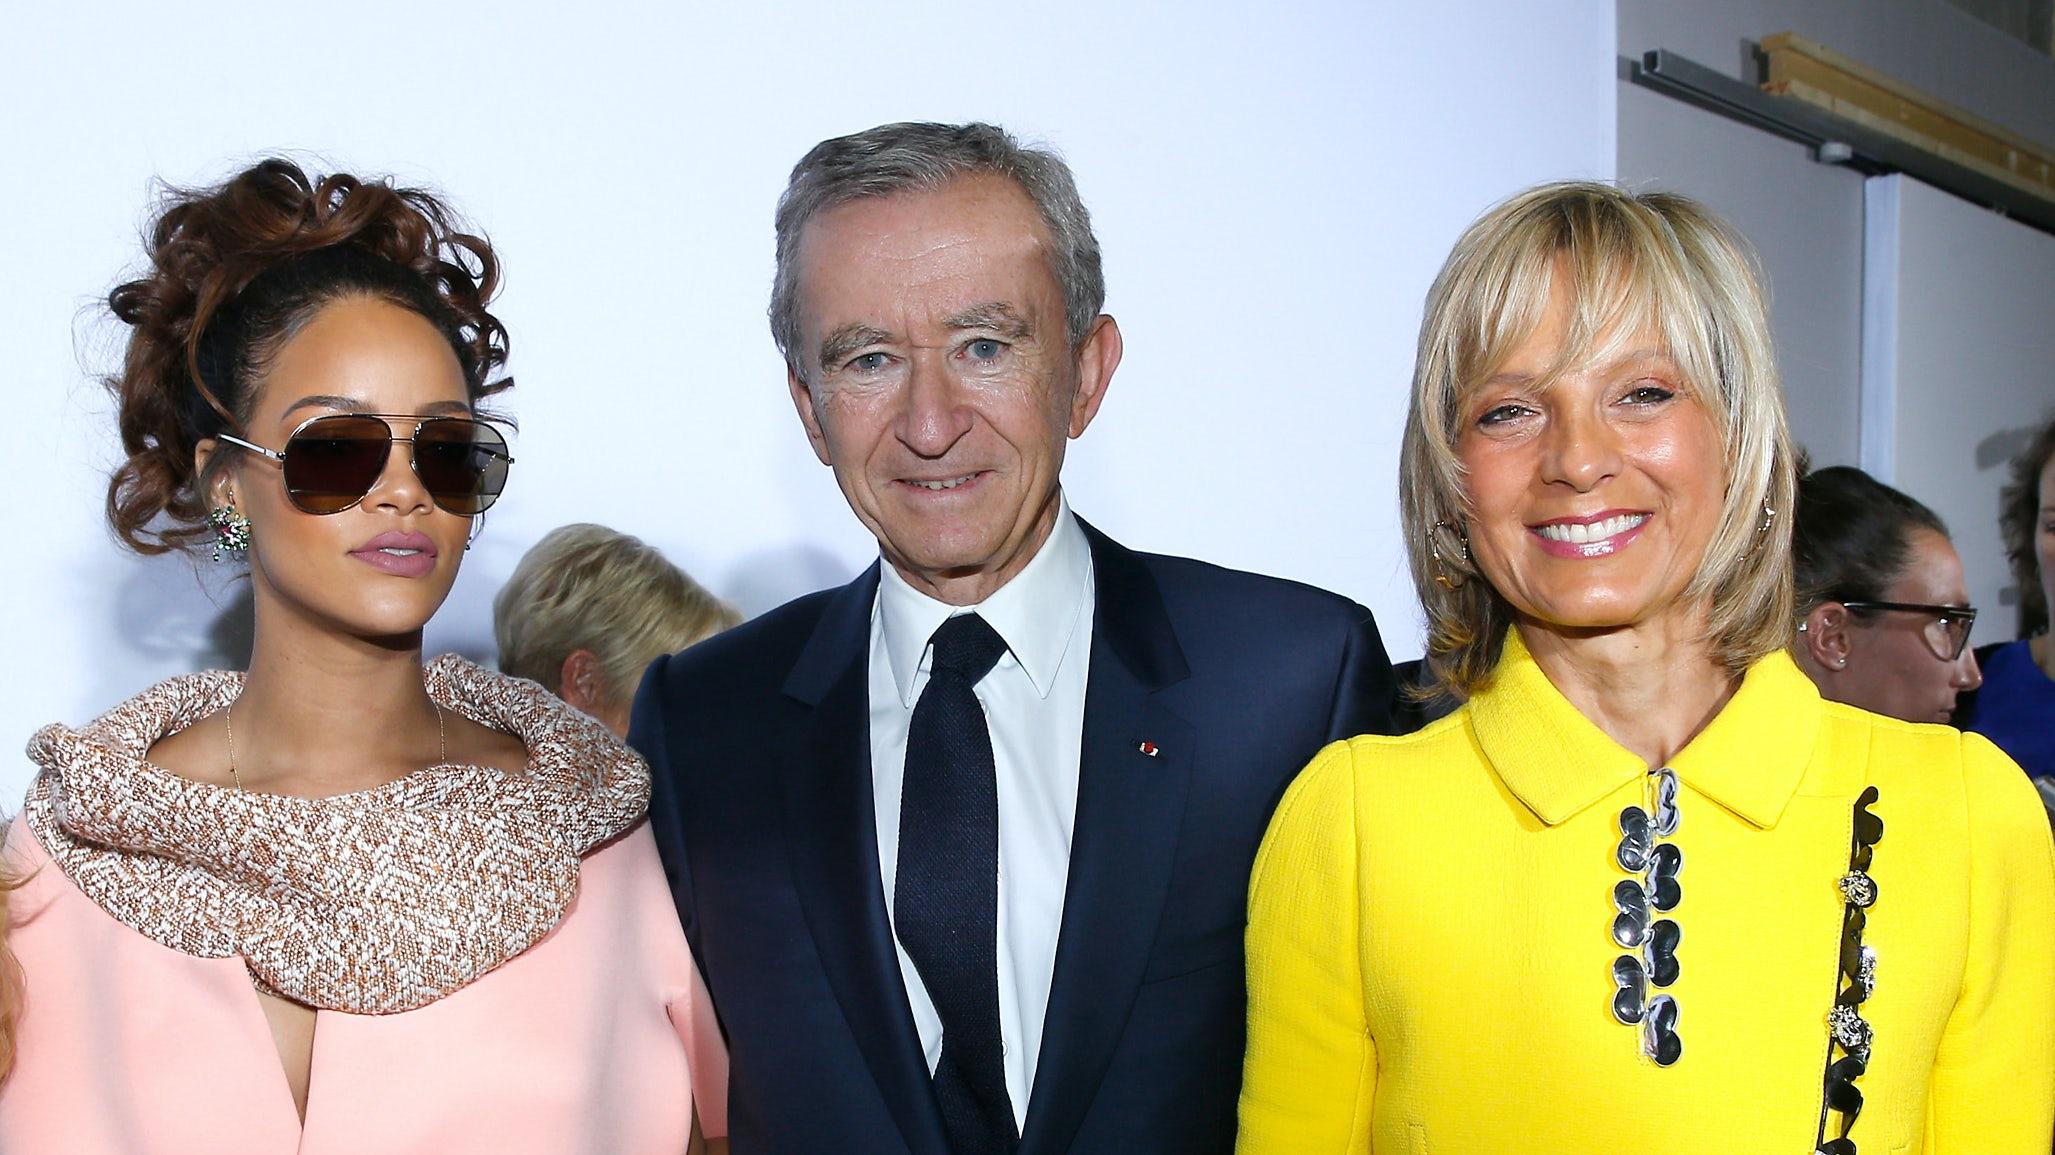 Rihanna, Bernard Arnault and Helene Arnault after Christian Dior show at Paris Fashion Week  Spring/Summer 2016   Source: Getty